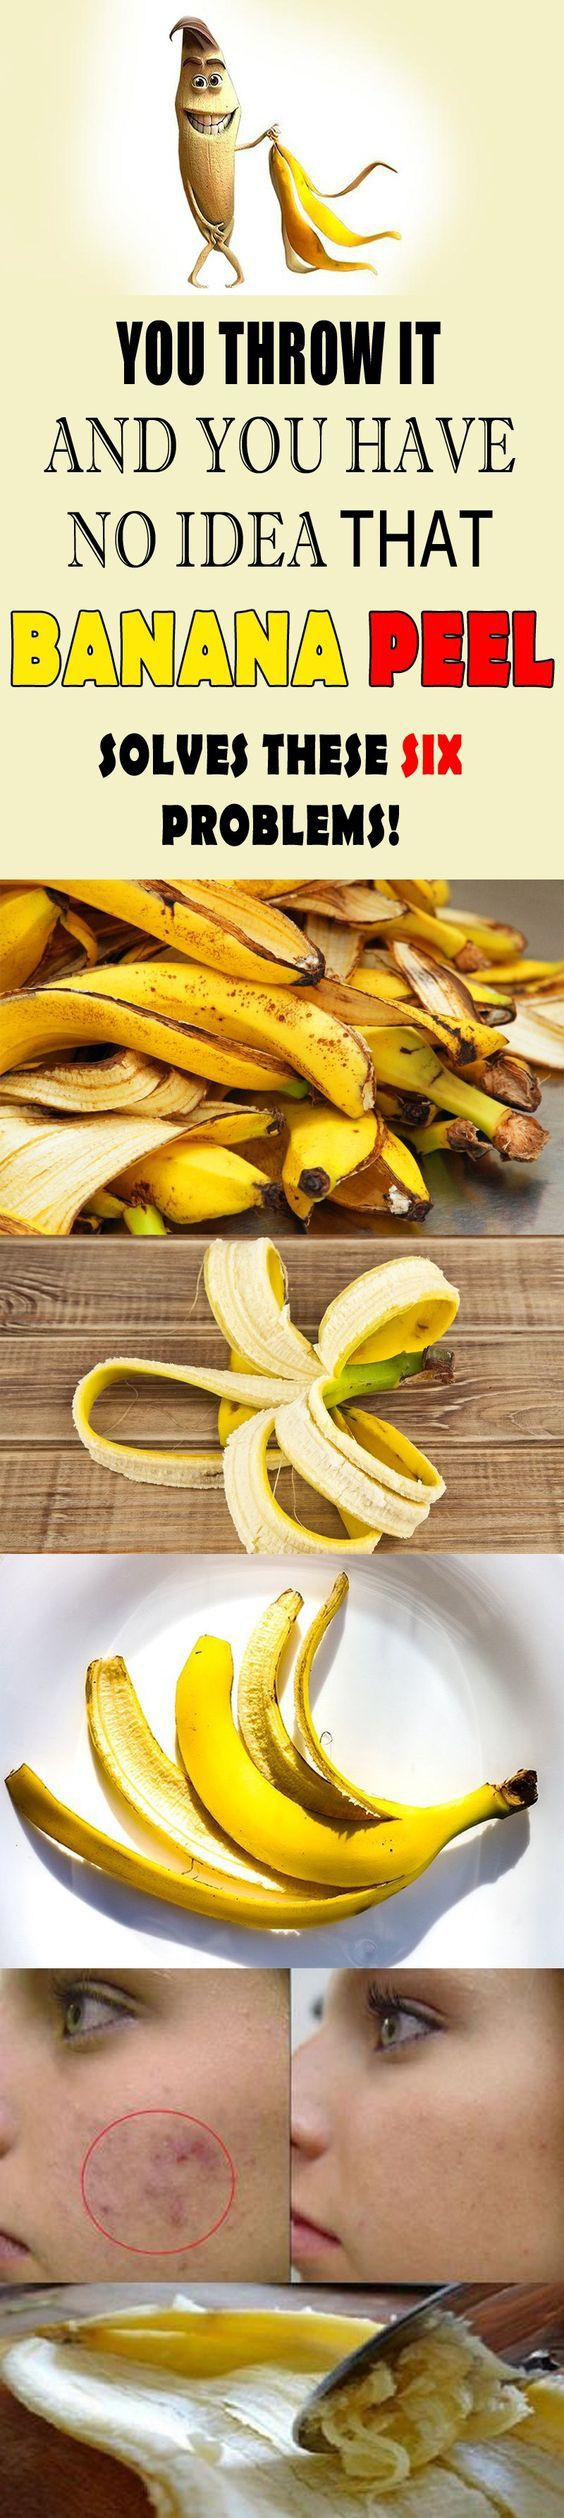 #banana #peel #throw #problems #benefits